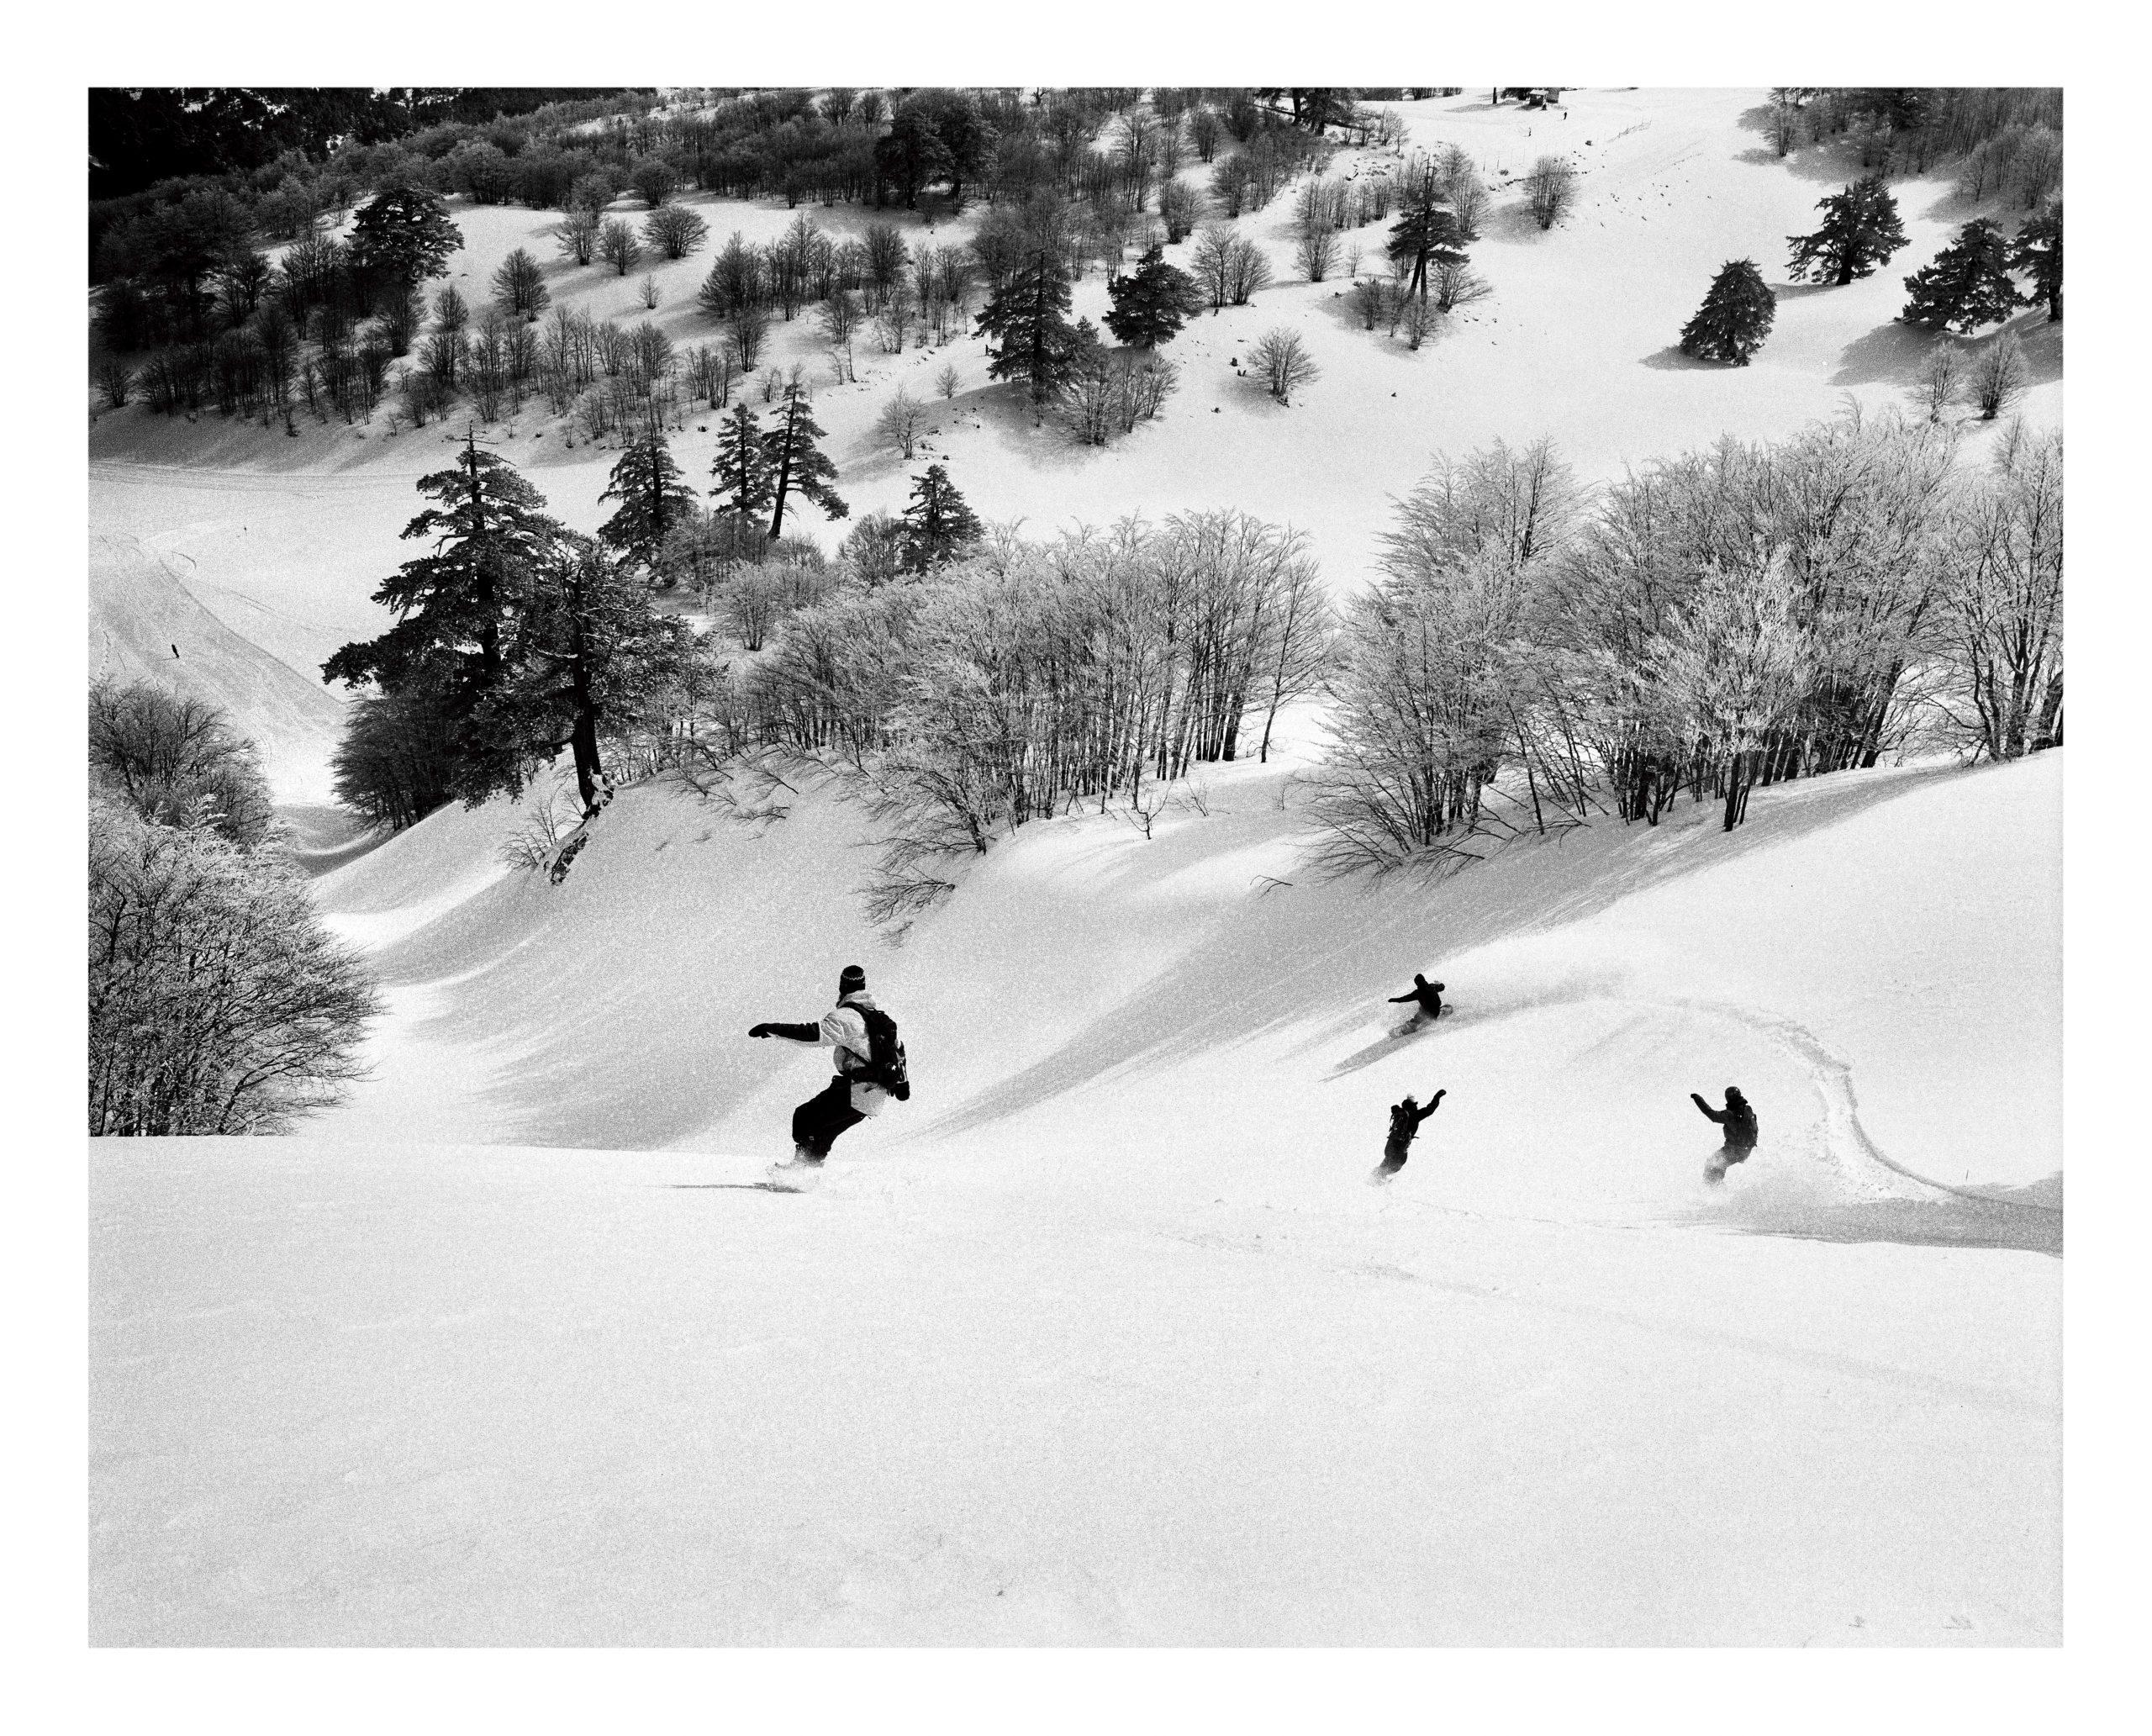 Backcountry snowboarding in Greece